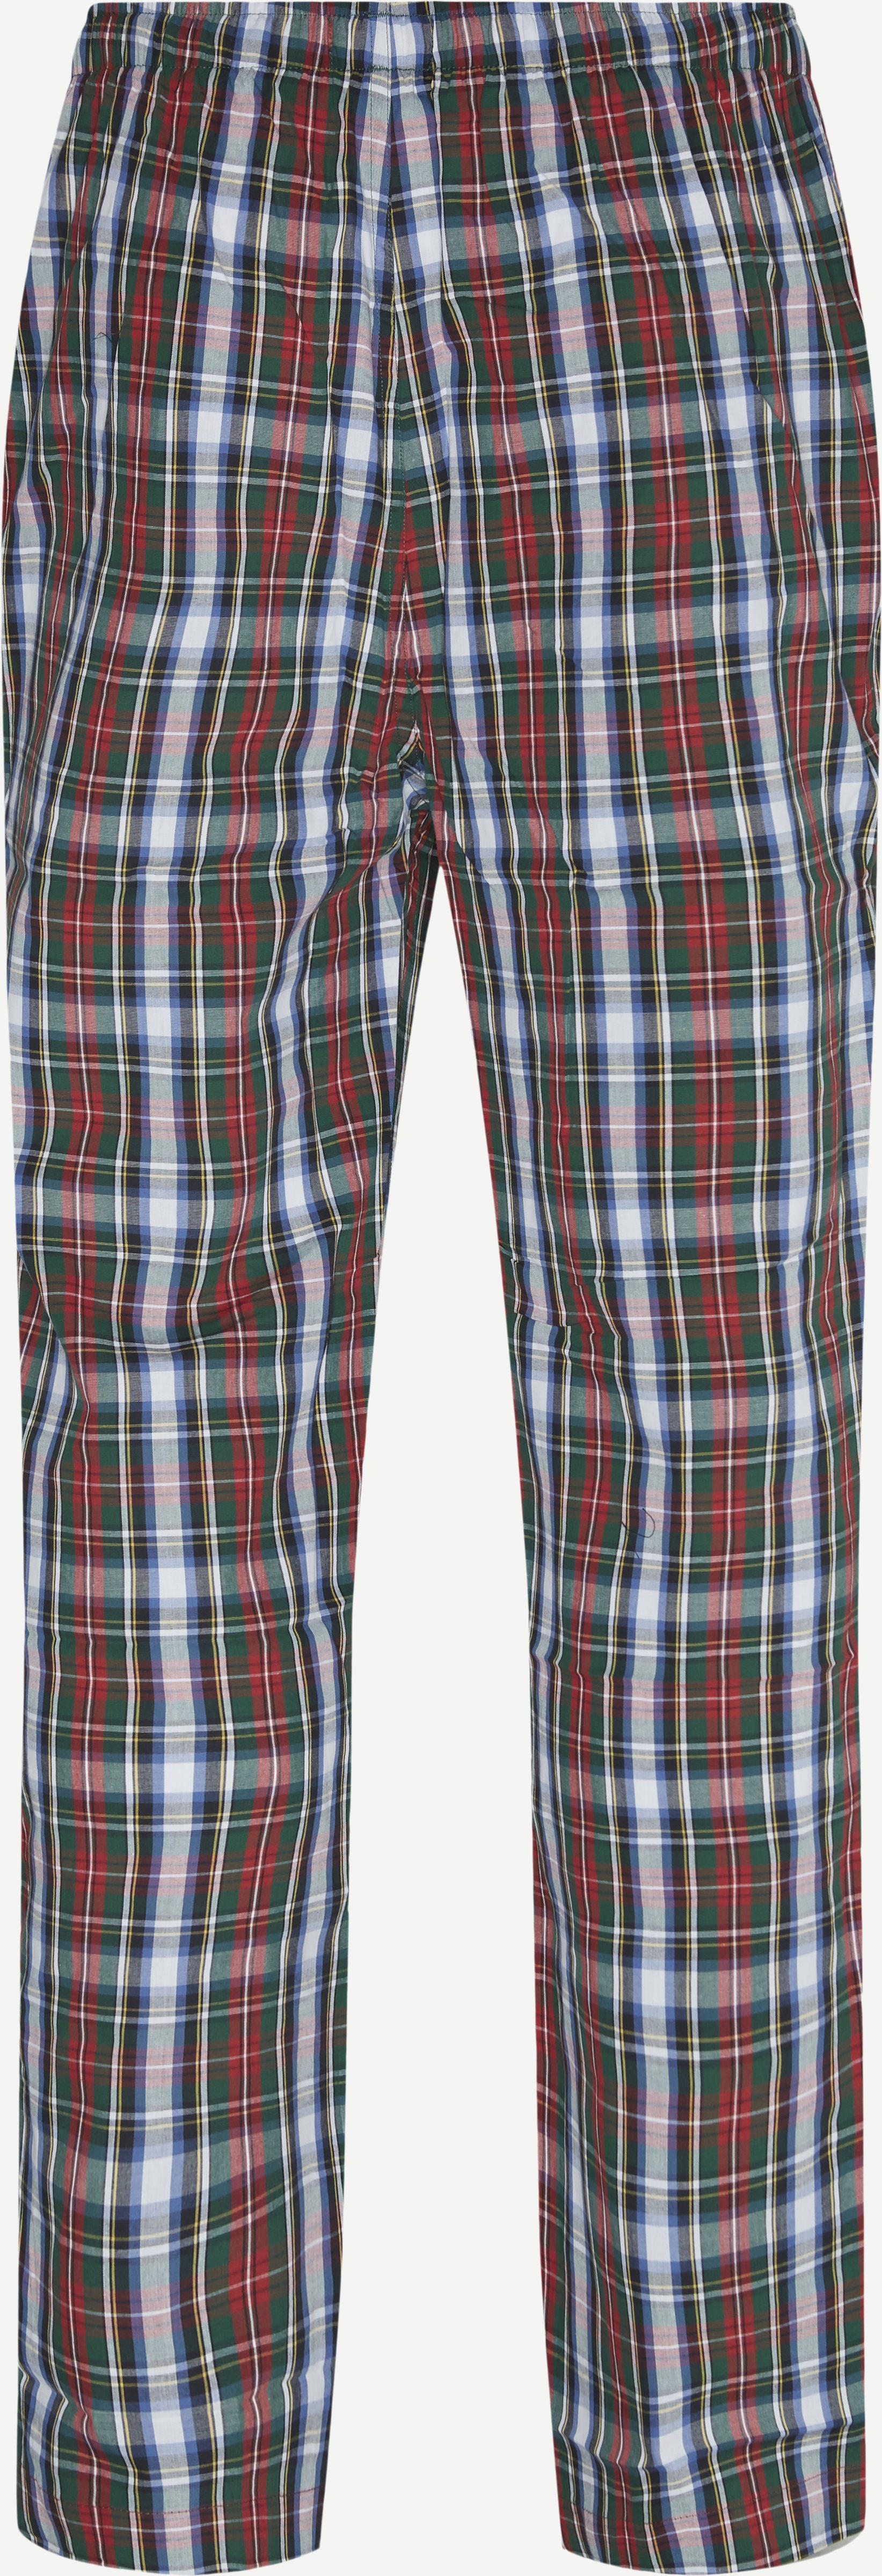 Underkläder - Regular - Röd